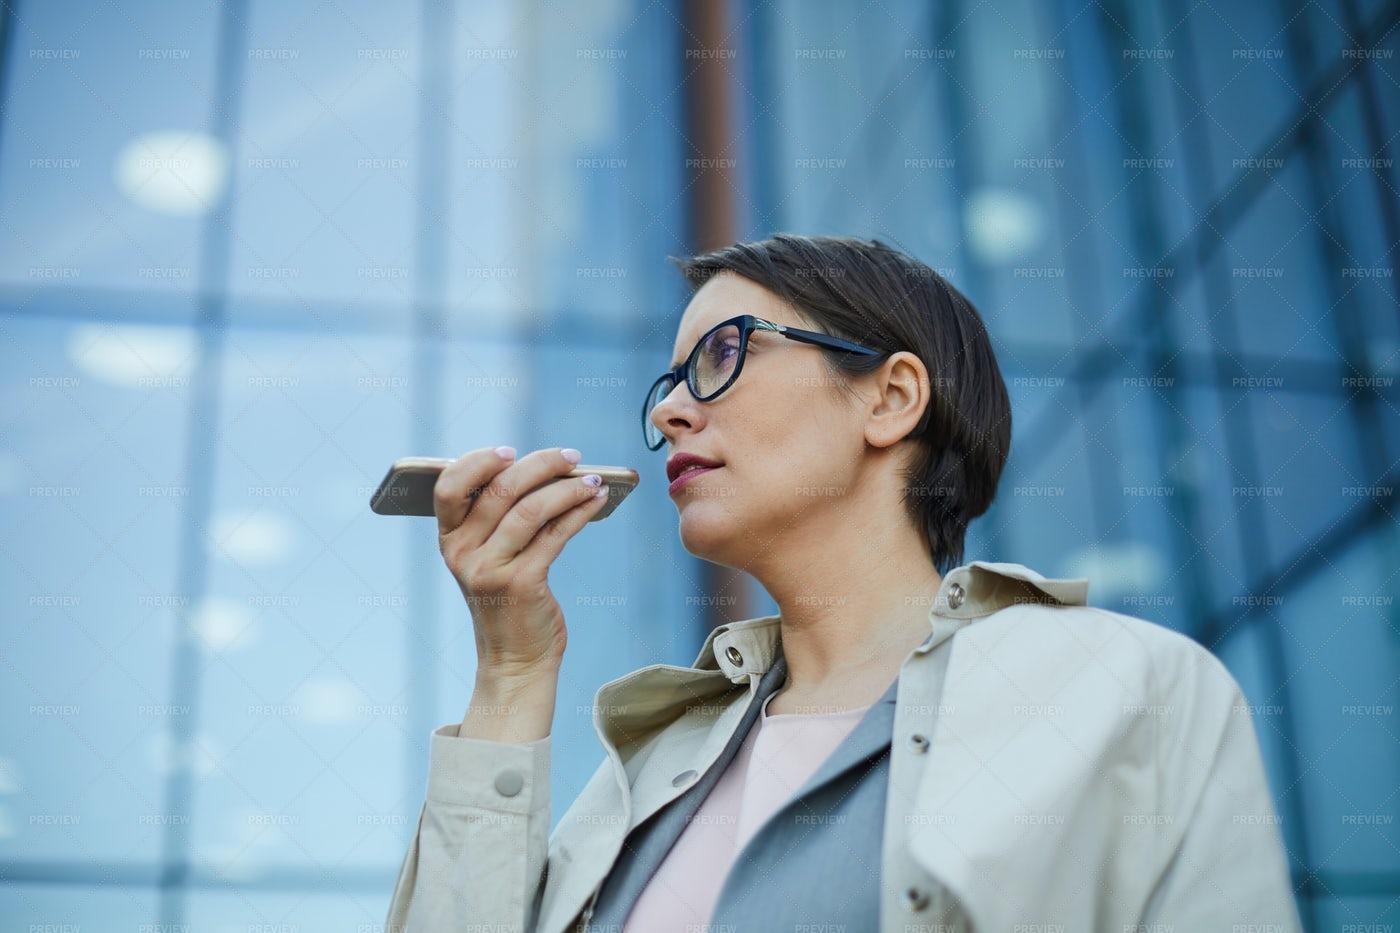 Businesswoman Recording Voice...: Stock Photos